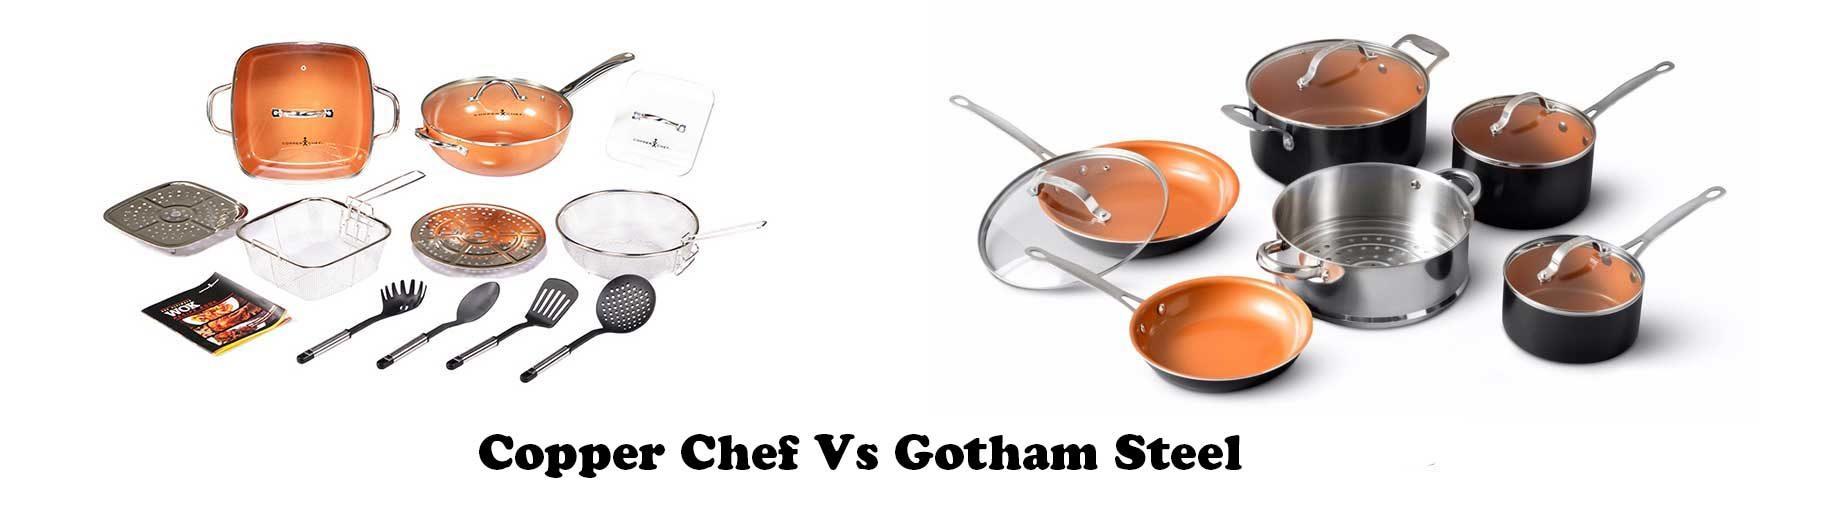 gotham-steel-vs-copper-chef-1